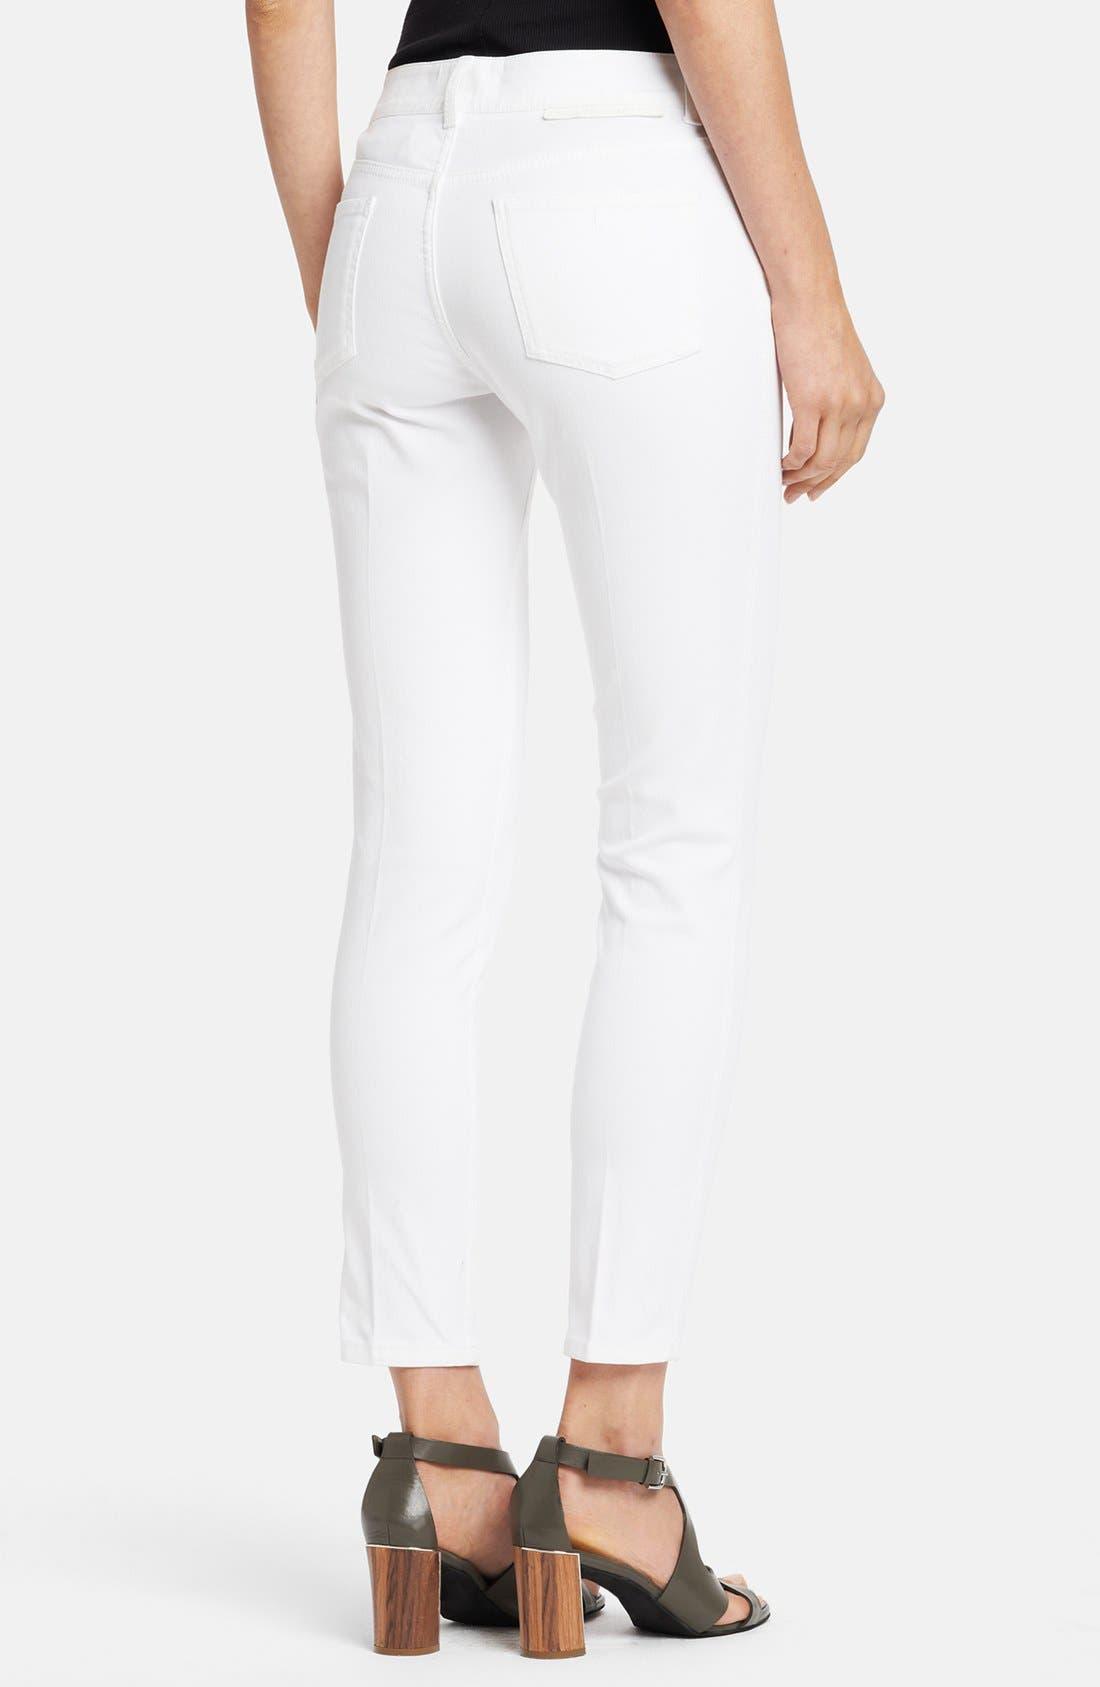 Alternate Image 2  - Stella McCartney 'Simone' Skinny Ankle Grazer Jeans